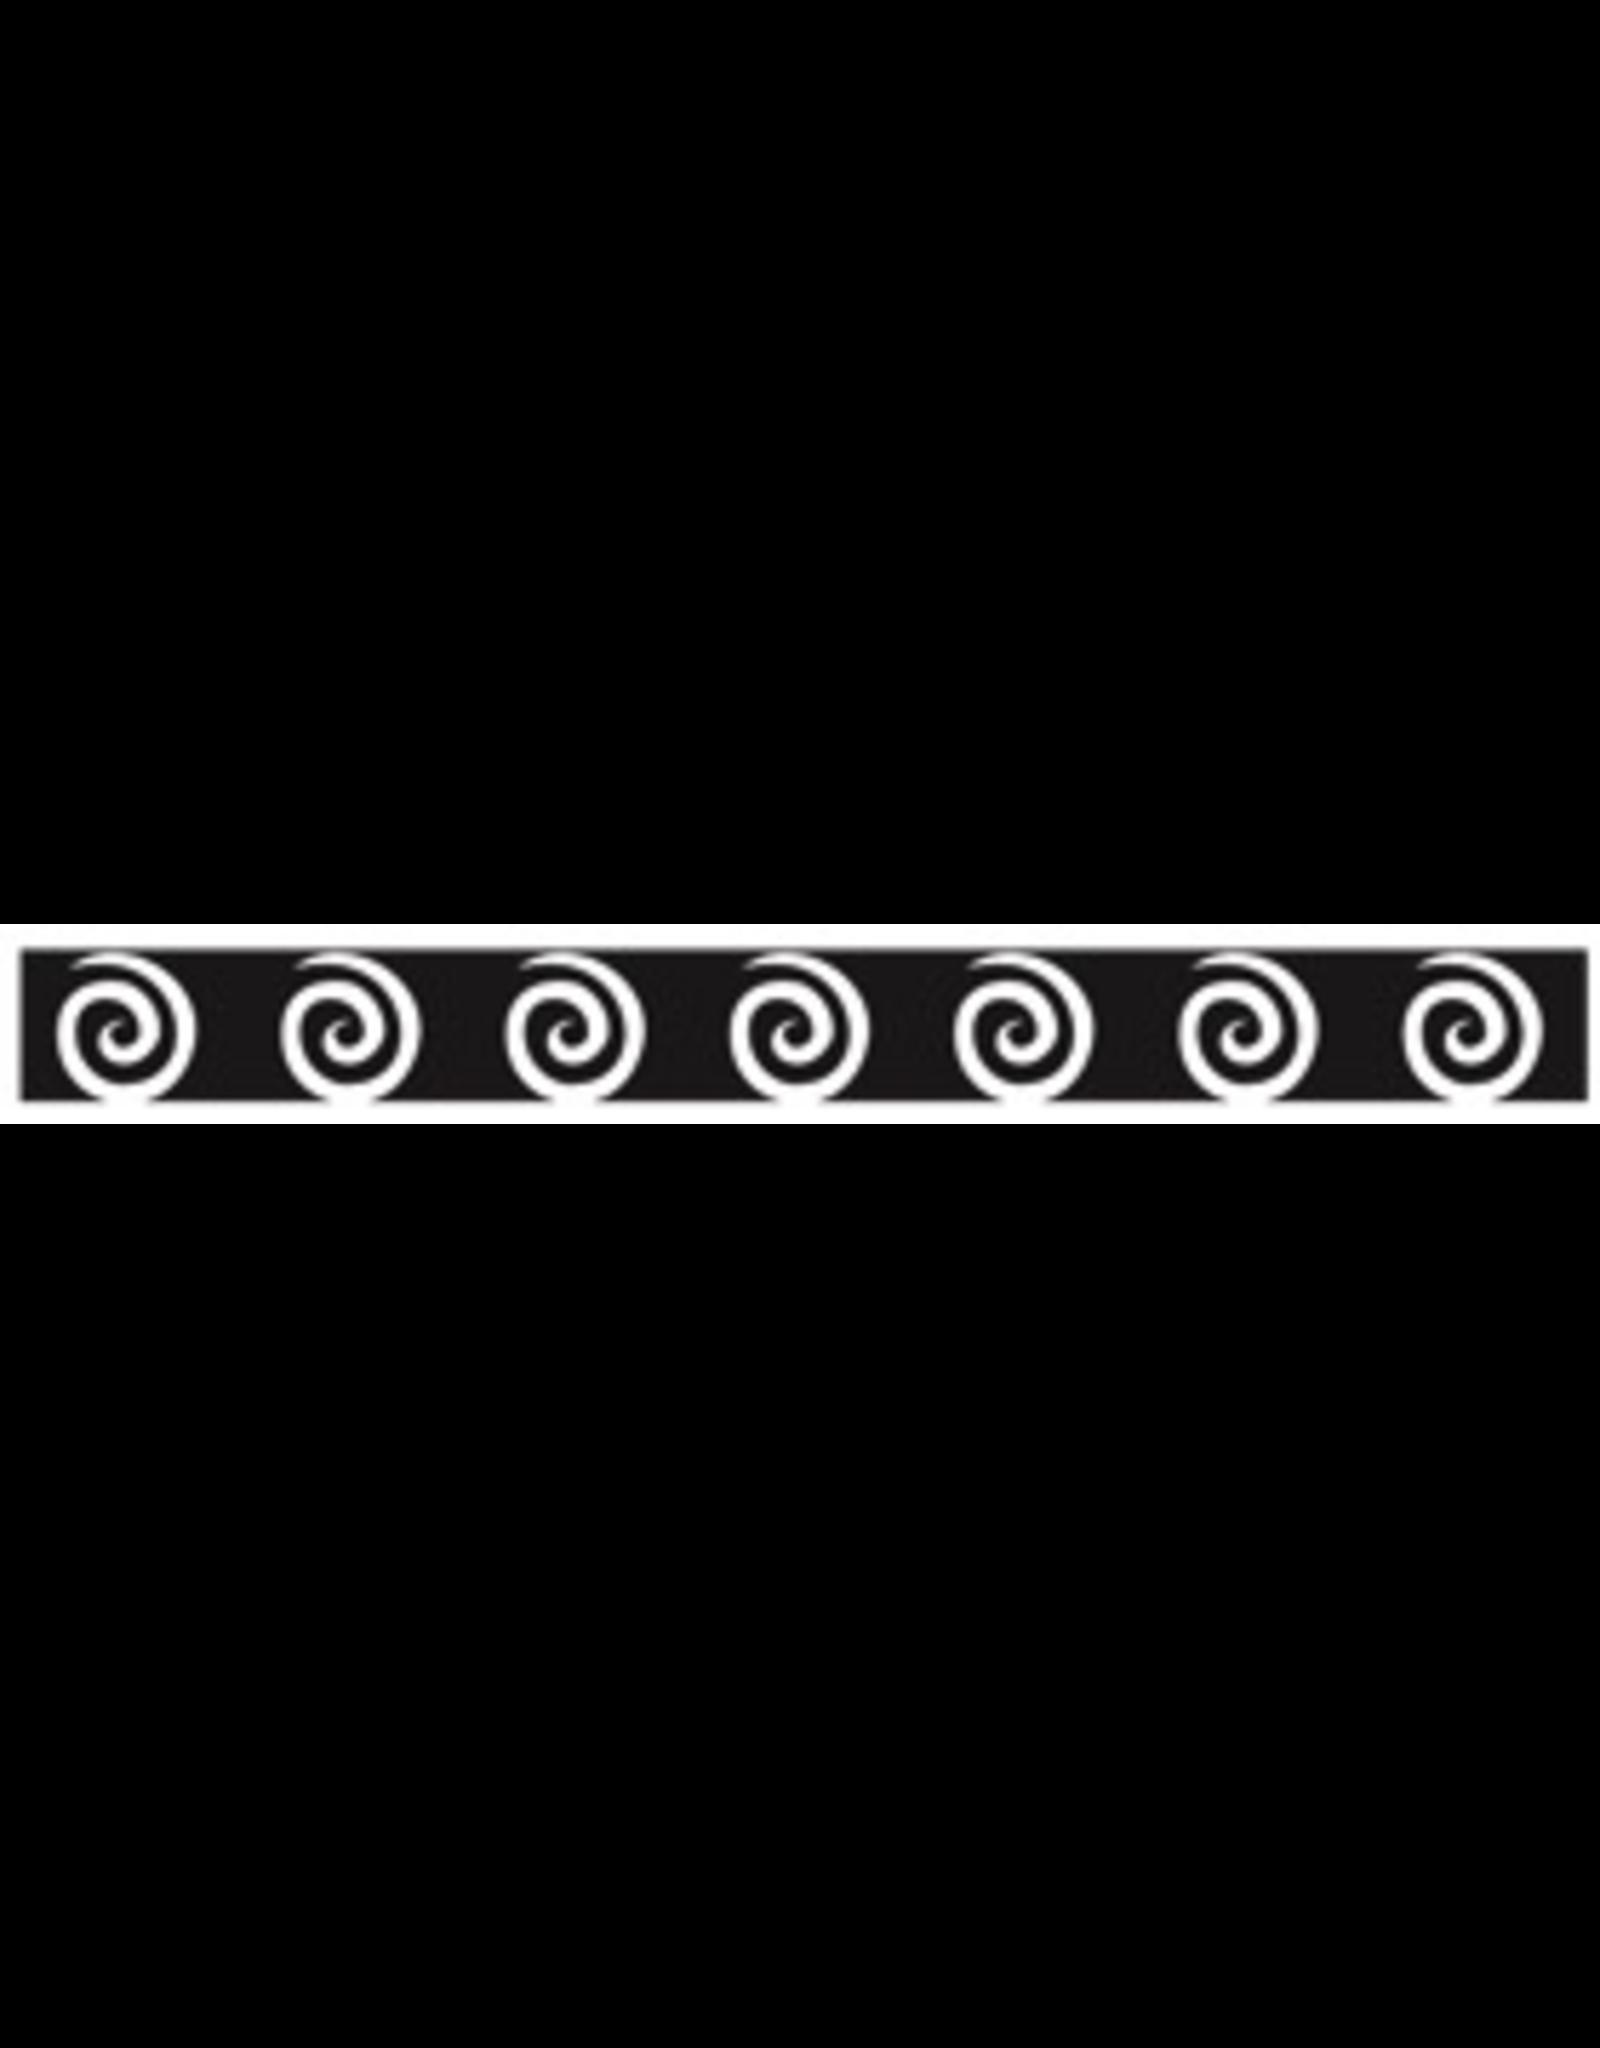 MKM tools Swirls Pattern Roller